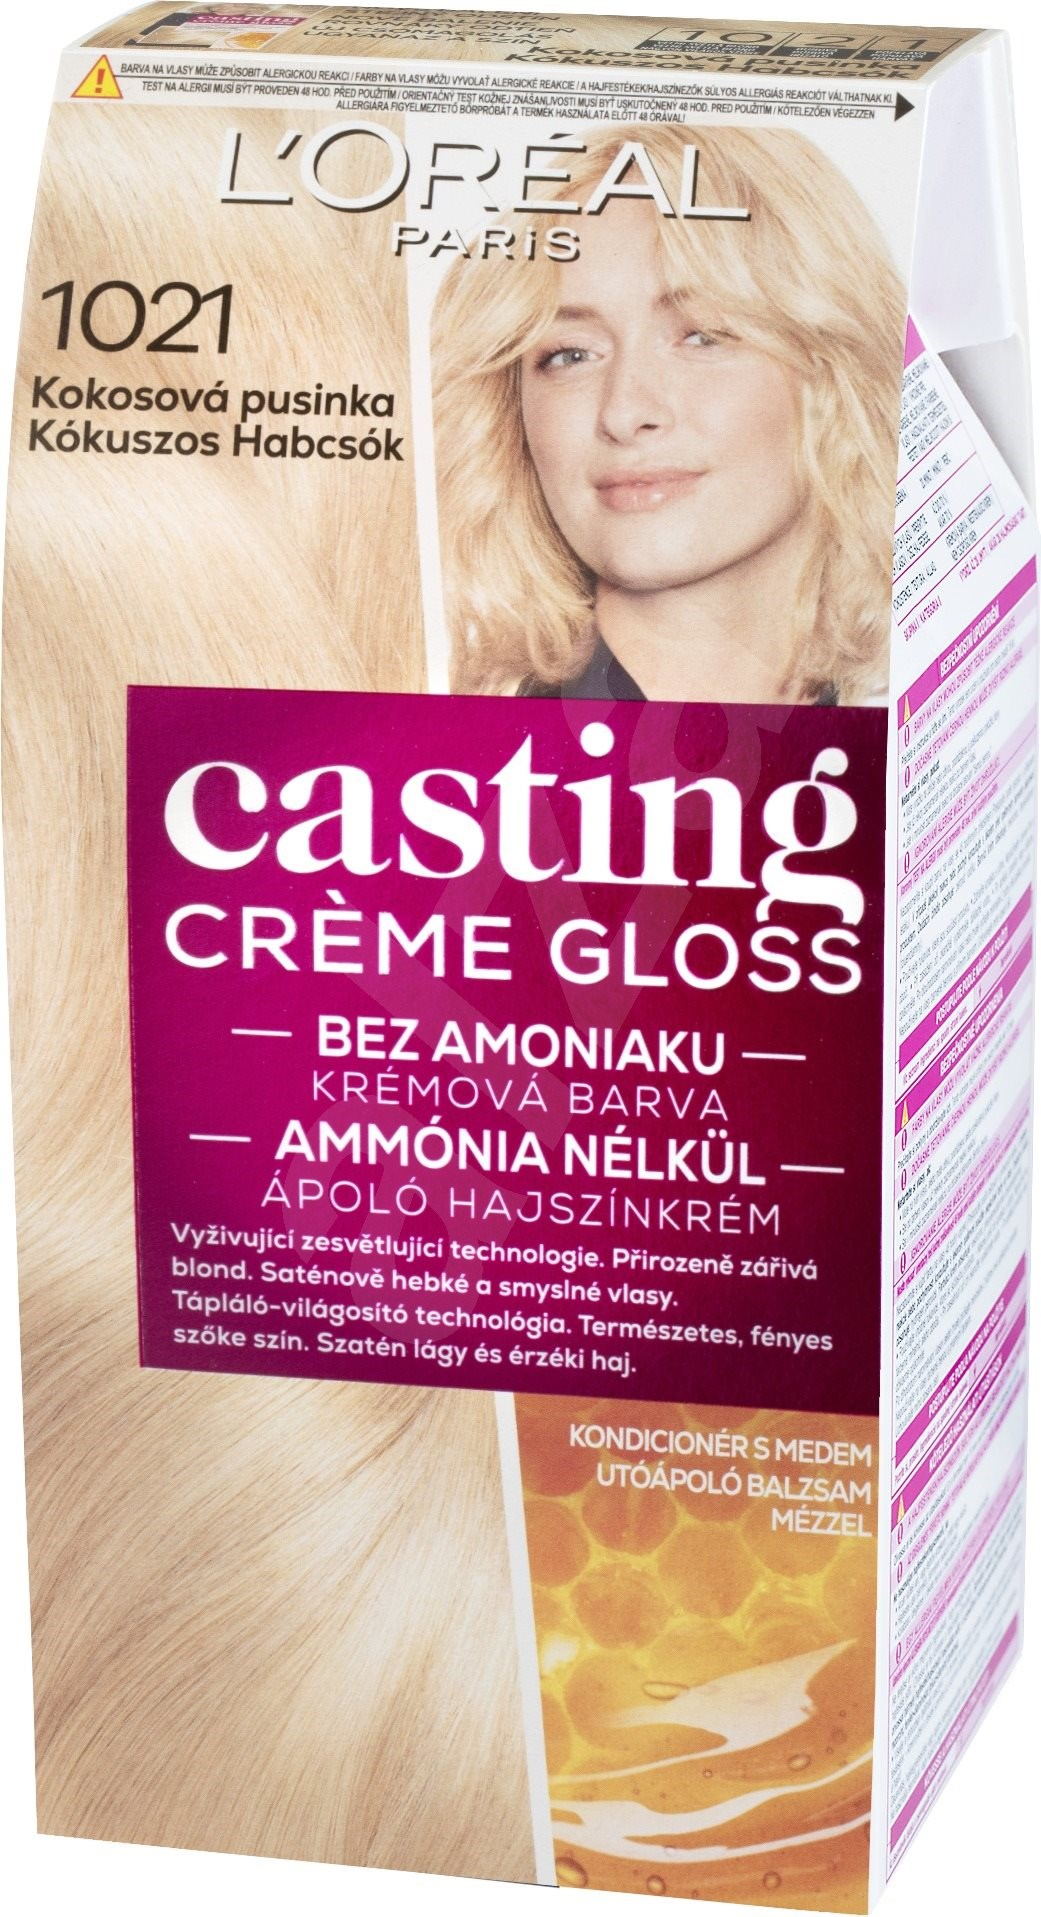 L Or 201 Al Casting Creme Gloss 1021 Blond Světl 225 Perleťov 225